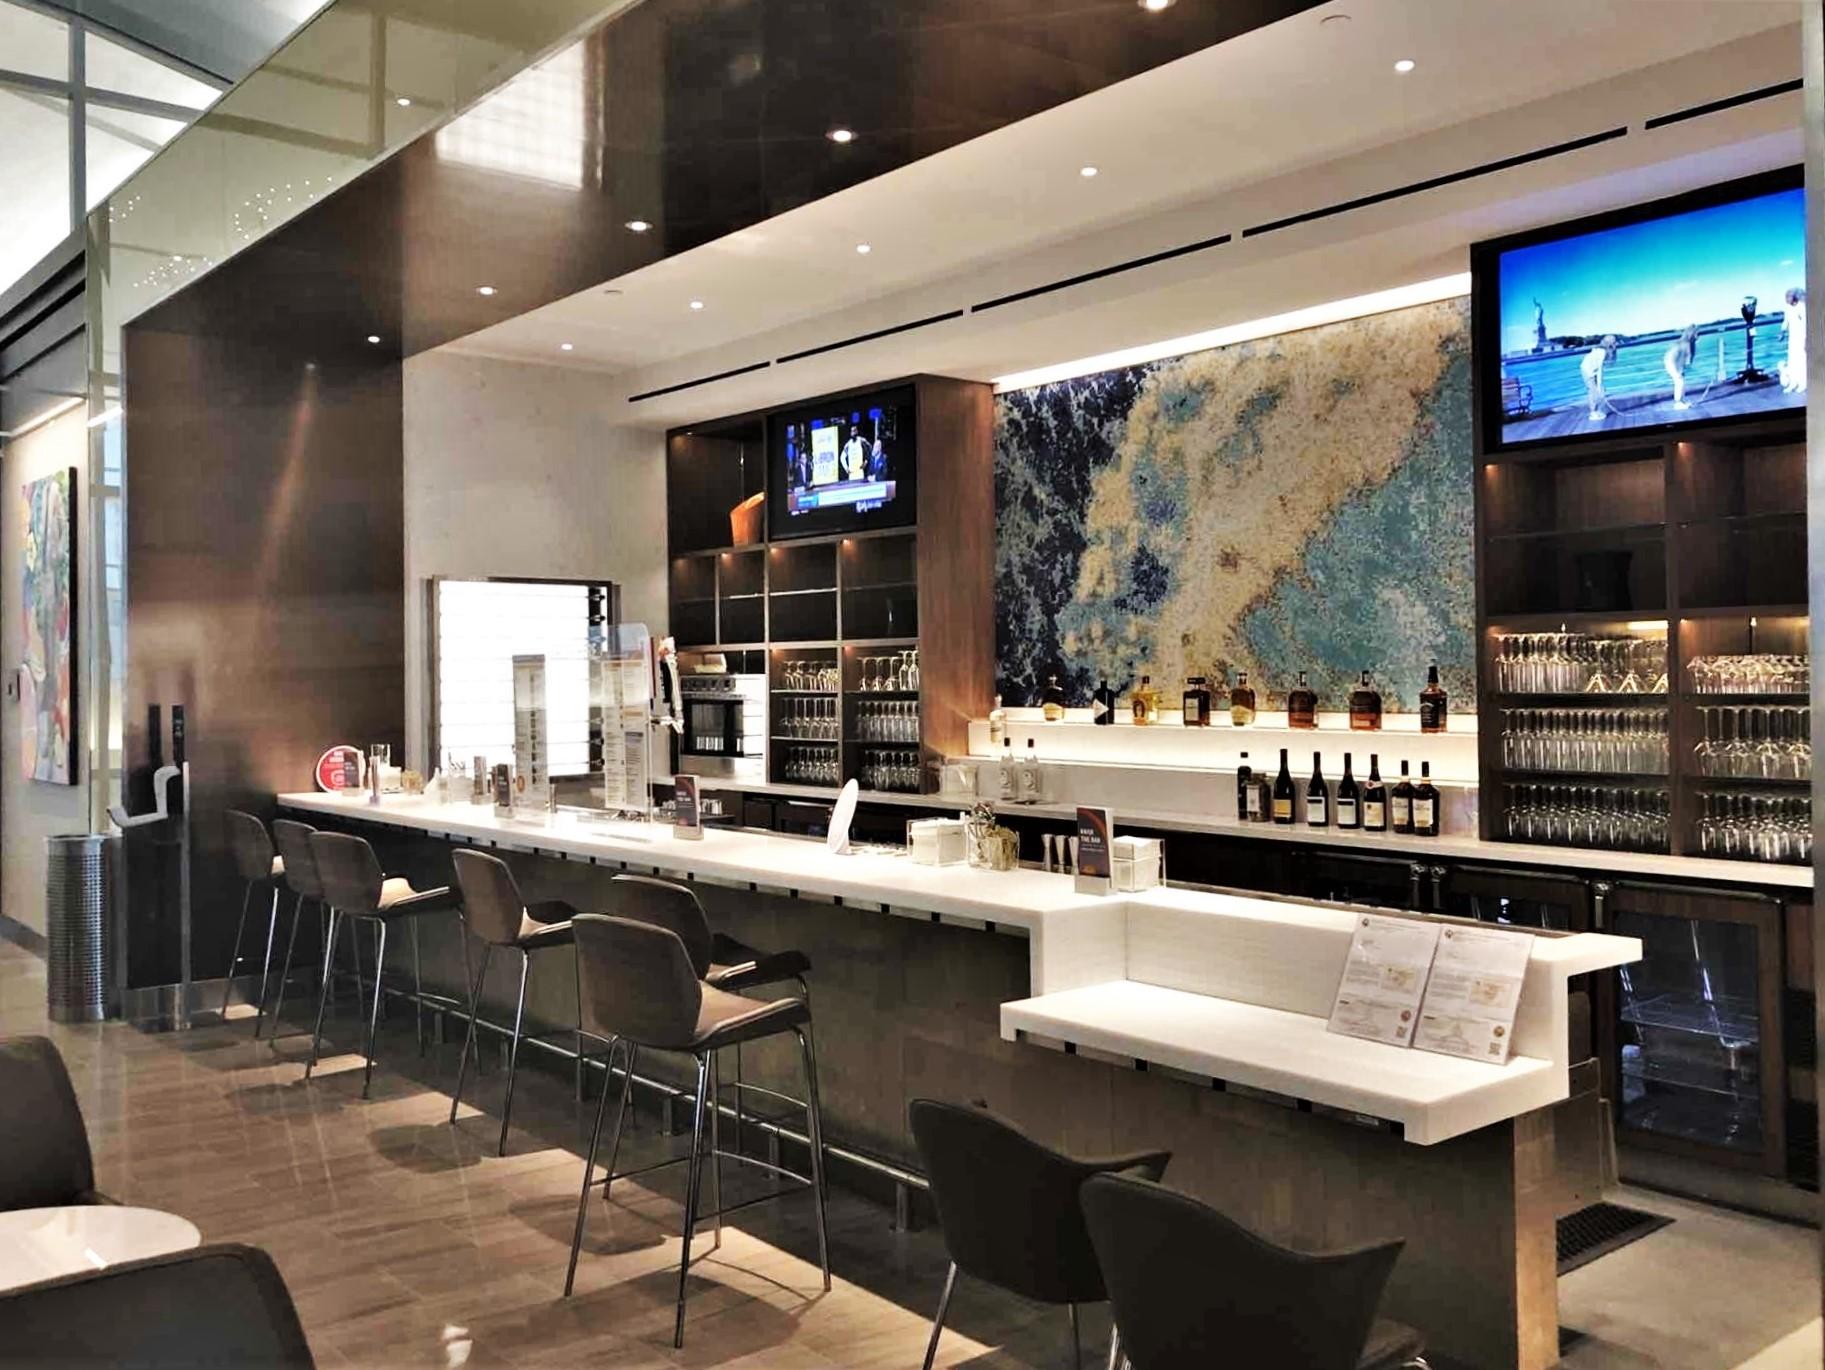 Delta Sky Club – Fort Lauderdale International Airport 2